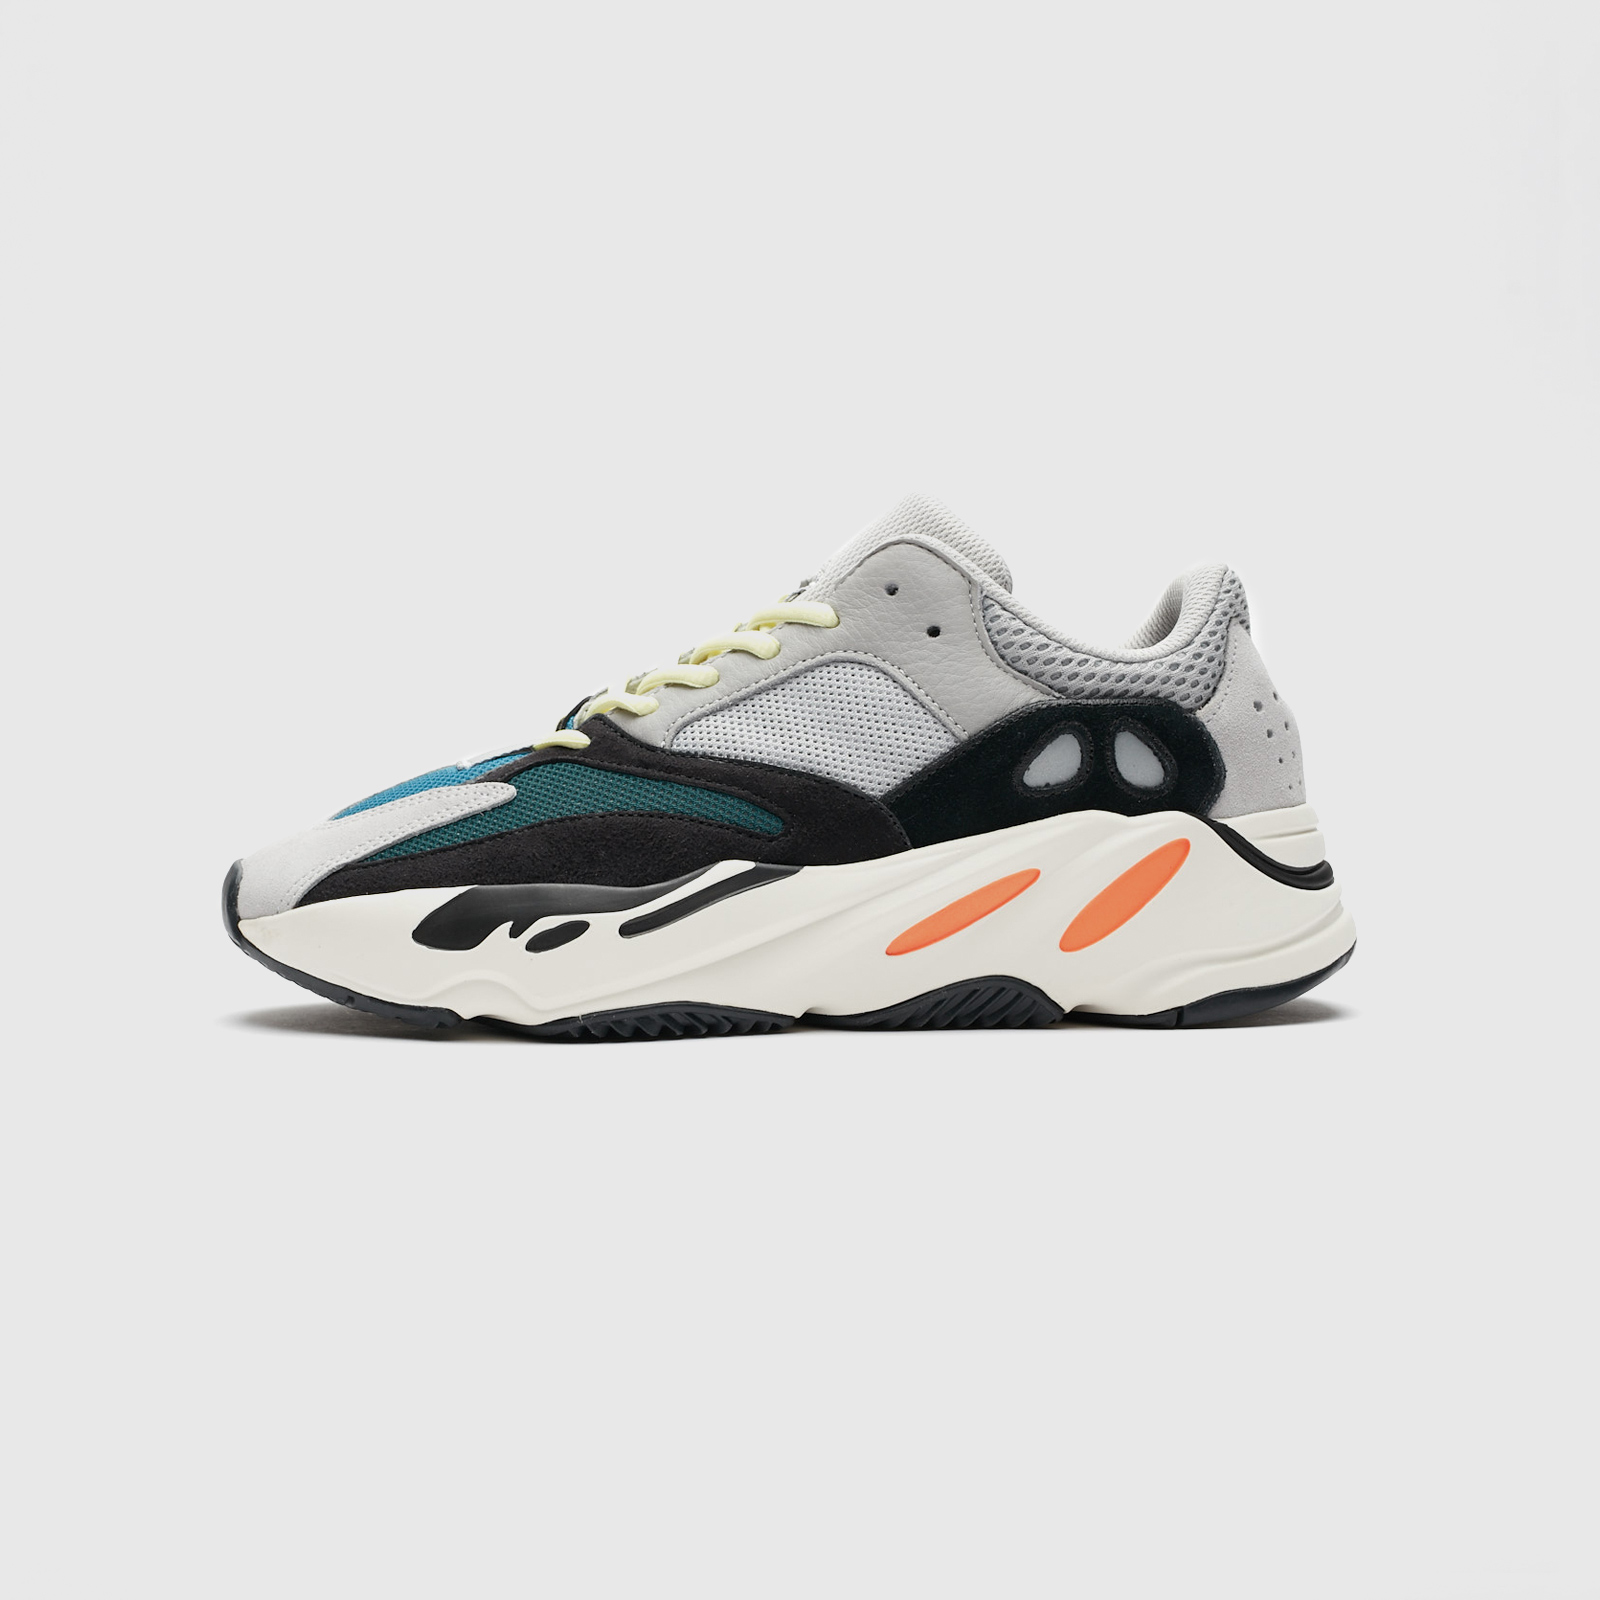 5c119cbacc7a6 adidas Yeezy Boost 700 - B75571 - Sneakersnstuff